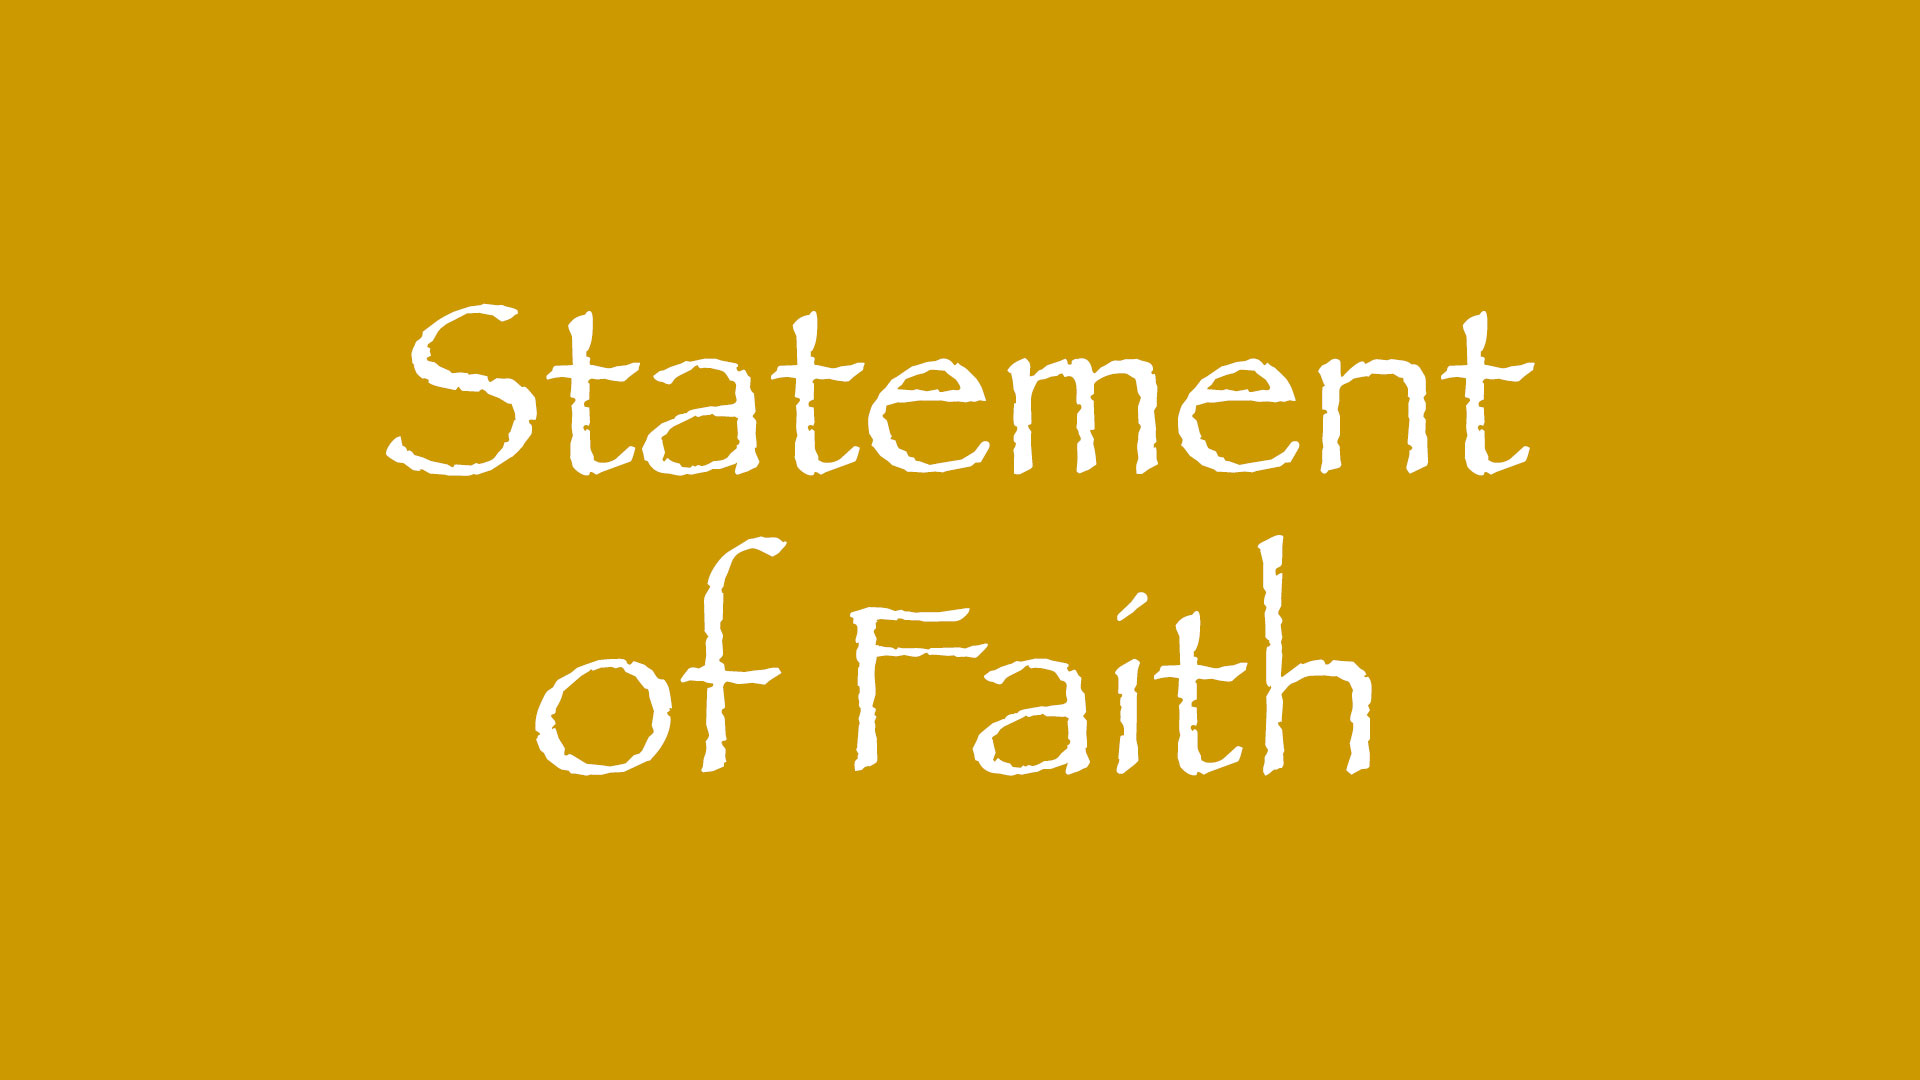 about salt ventures - statement of faith